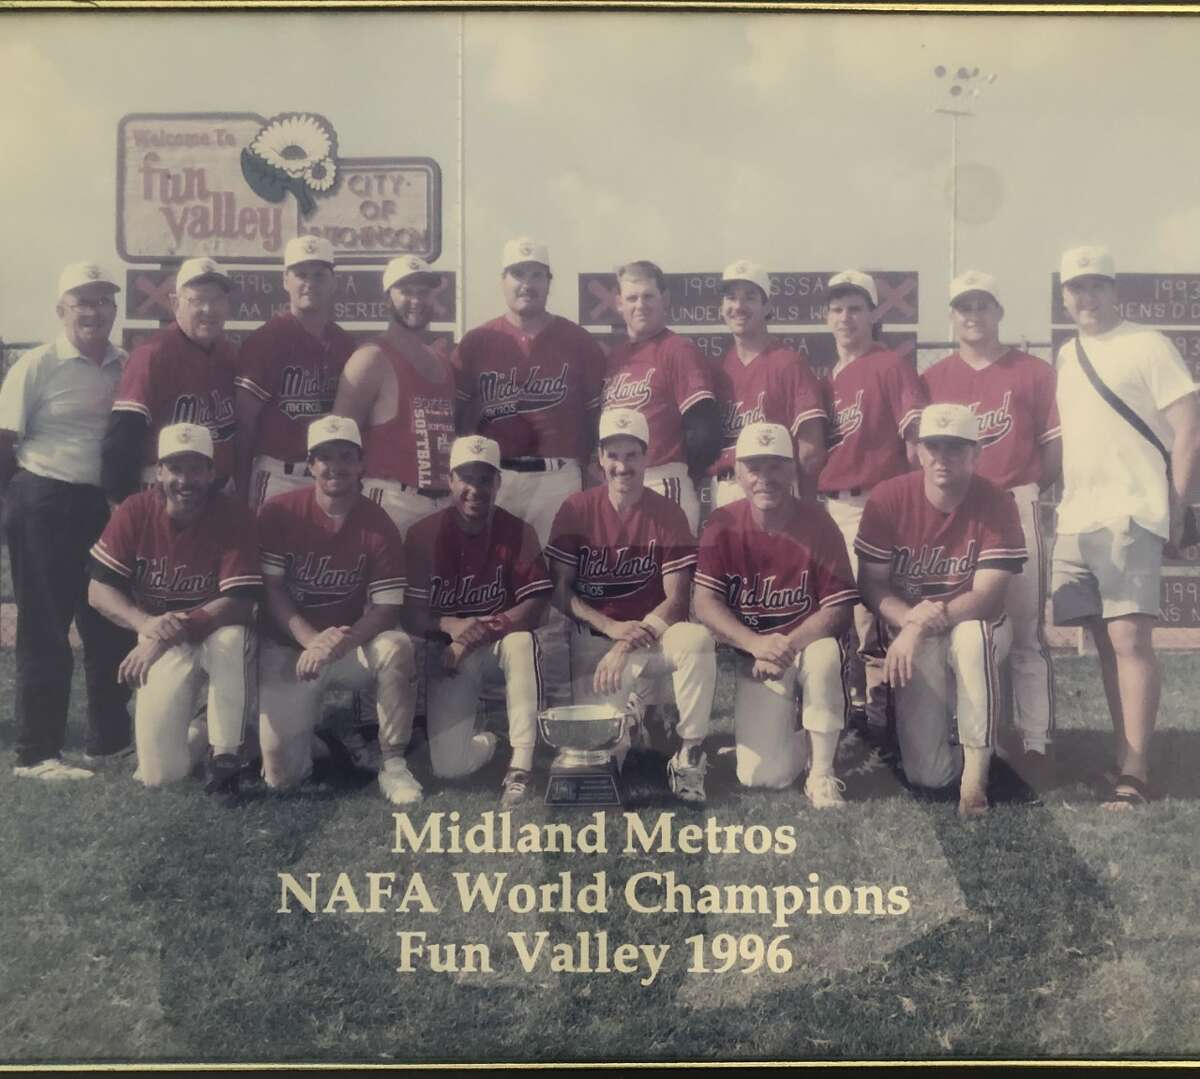 The Midland Metros' world championship photo in 1996 (Photo provided)